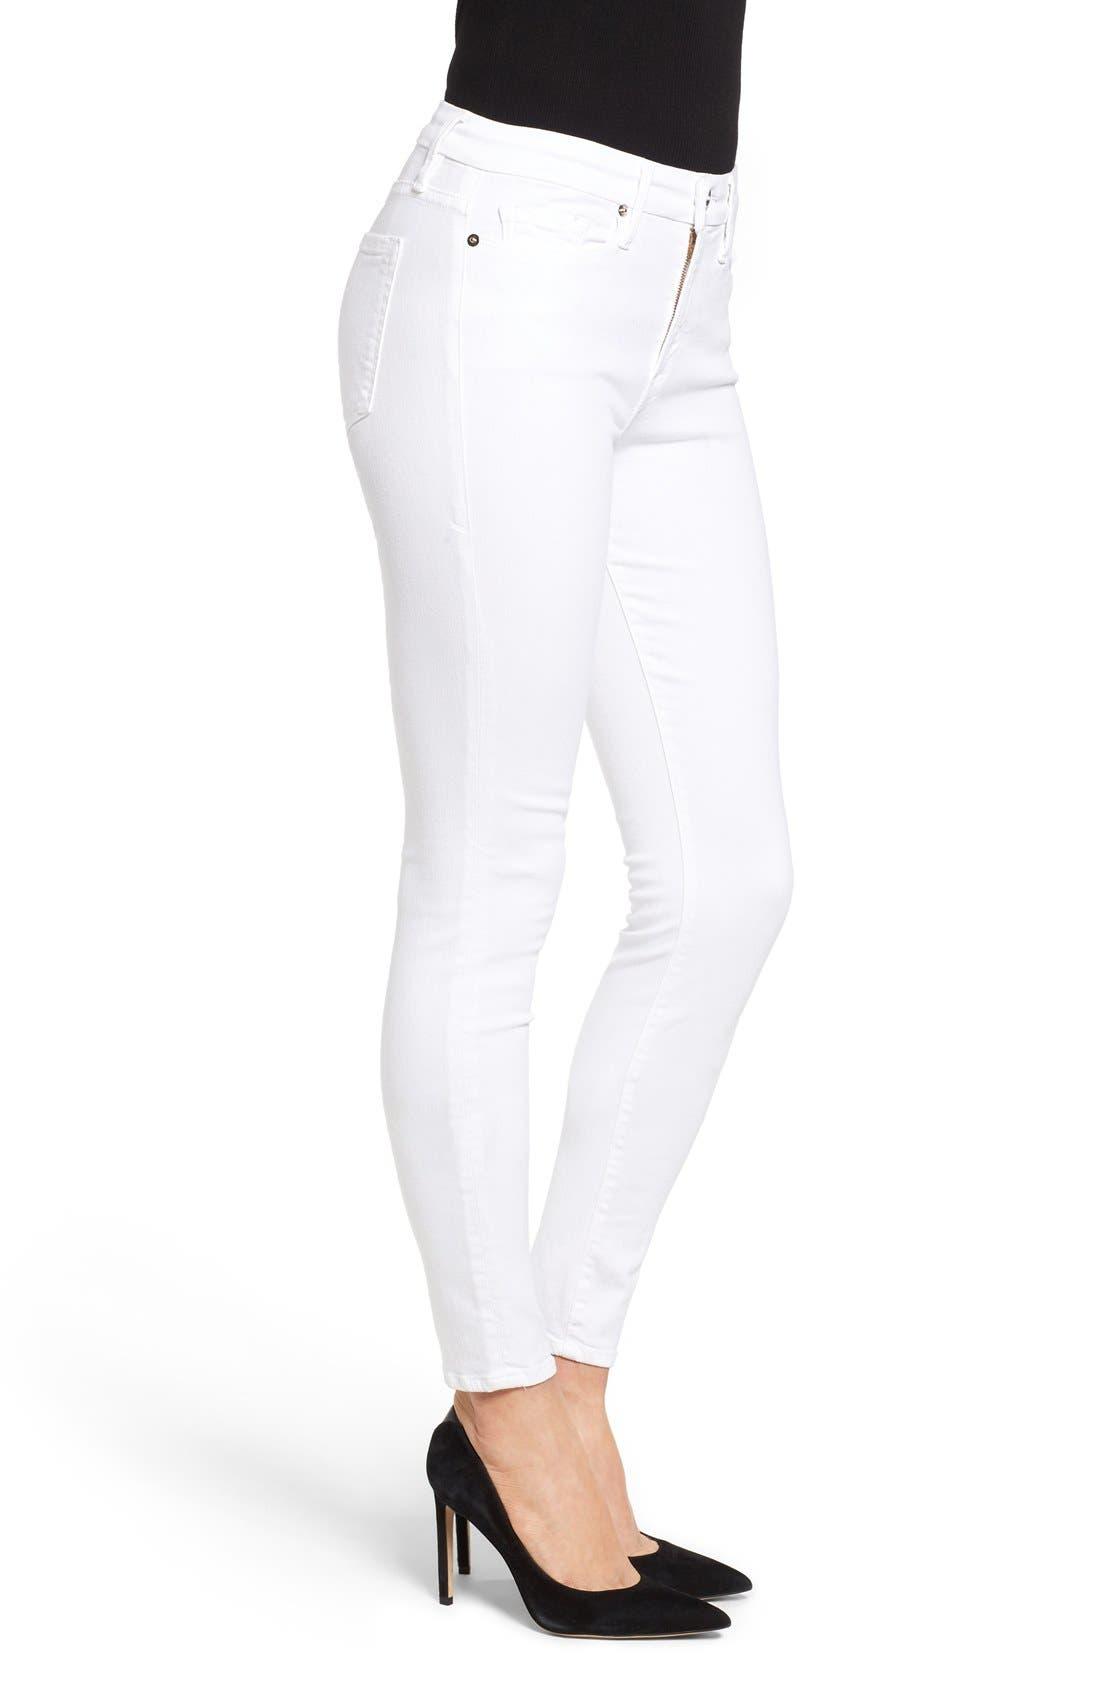 Alternate Image 3  - Good American Good Legs High Rise Skinny Jeans (White 001) (Extended Sizes)